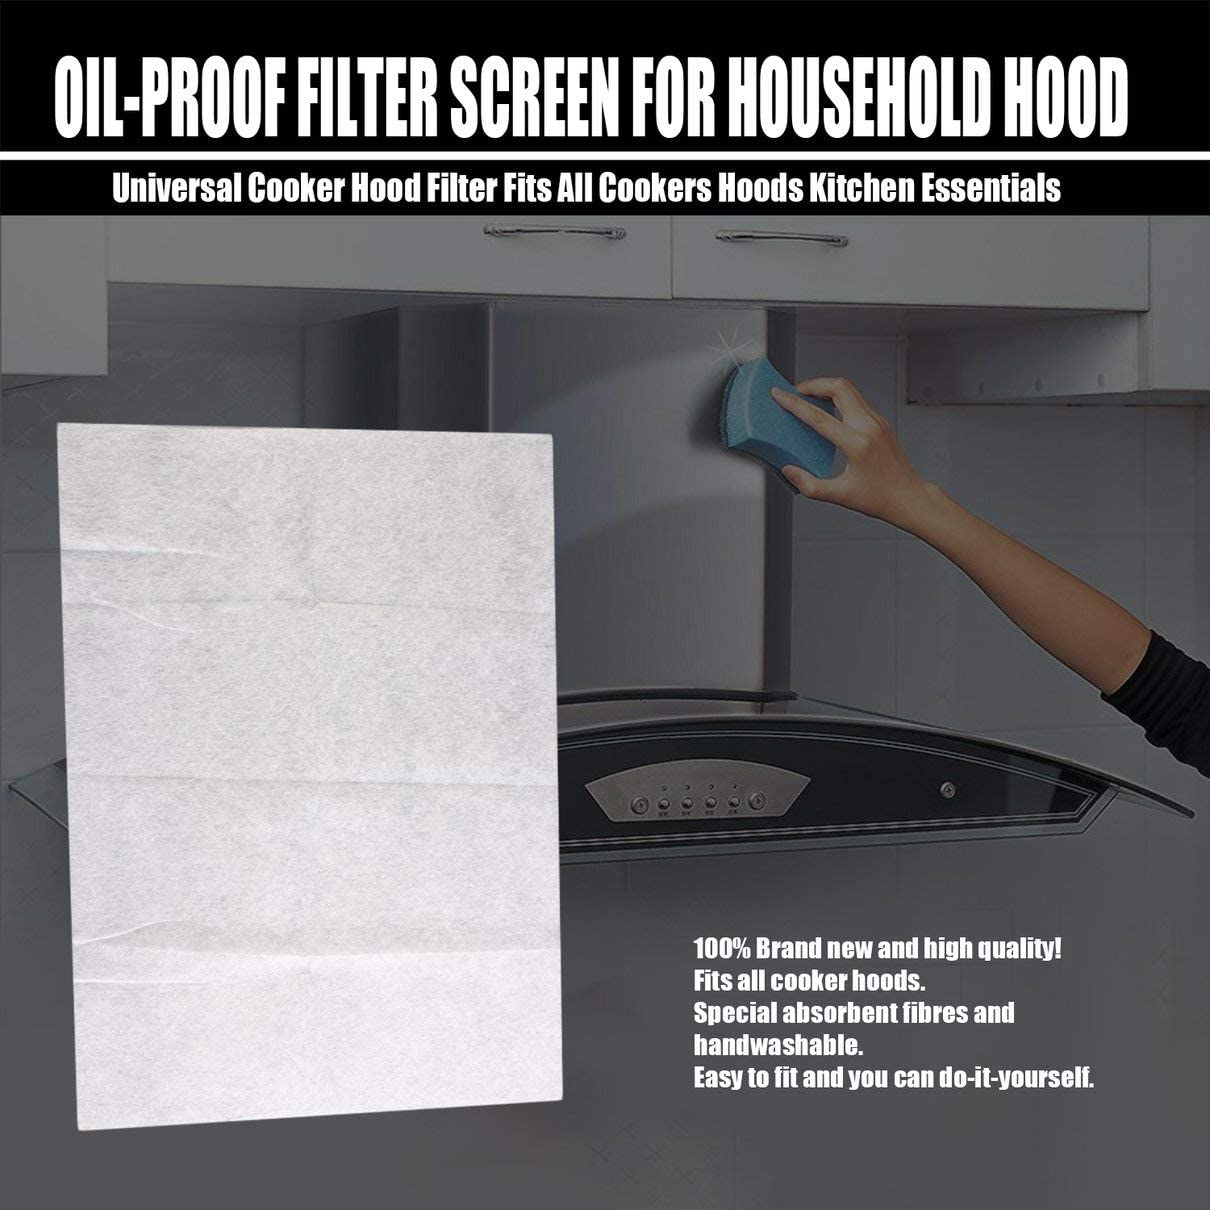 Filtro universale per cappe da cucina Adatto a tutte le cucine Cappe da cucina